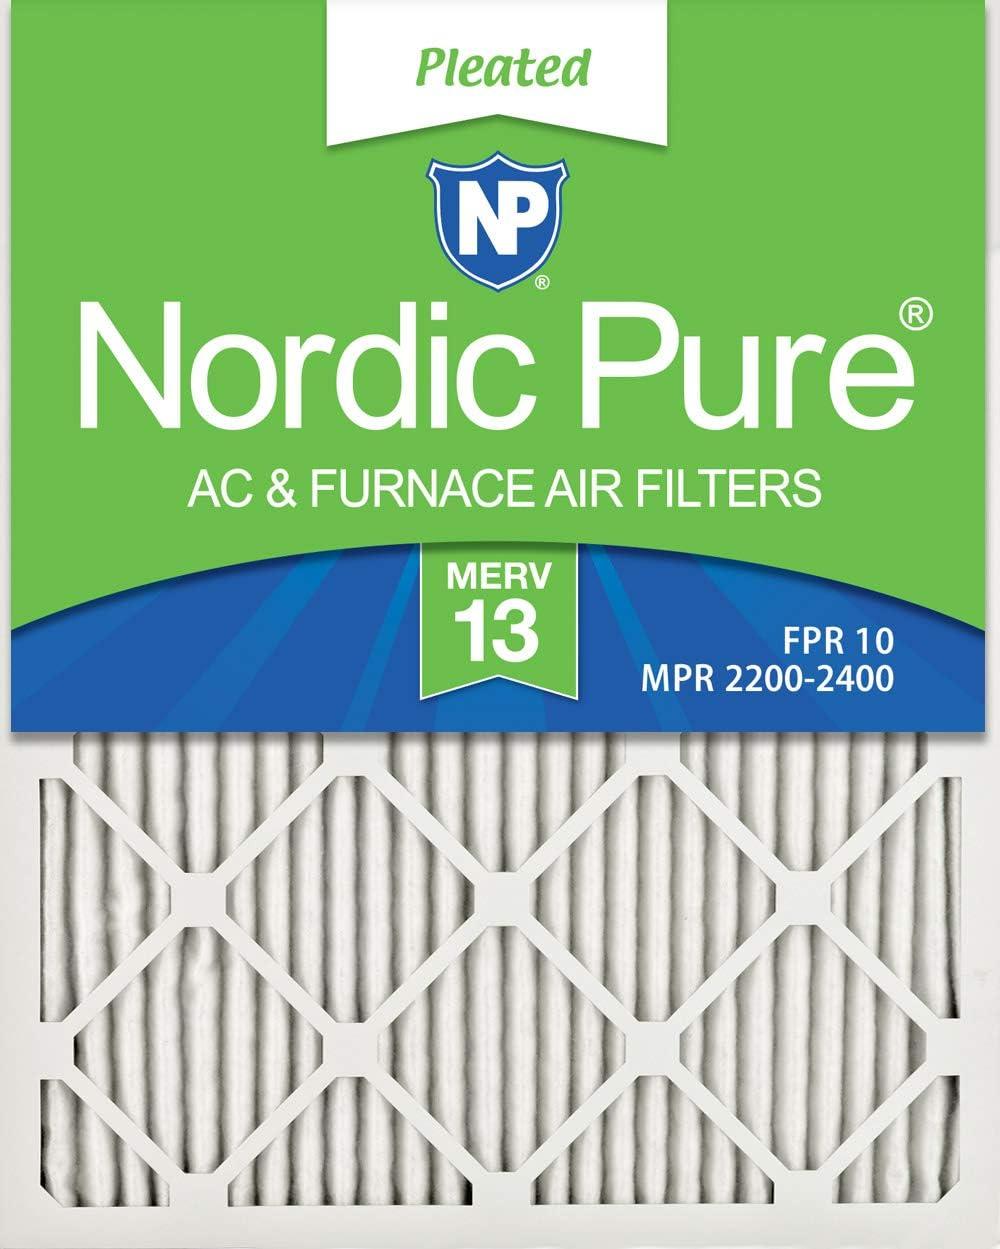 Nordic Pure 8x20x1 MERV 期間限定送料無料 13 Pleated キャンペーンもお見逃しなく Air AC Filters 2 Furnace Pack